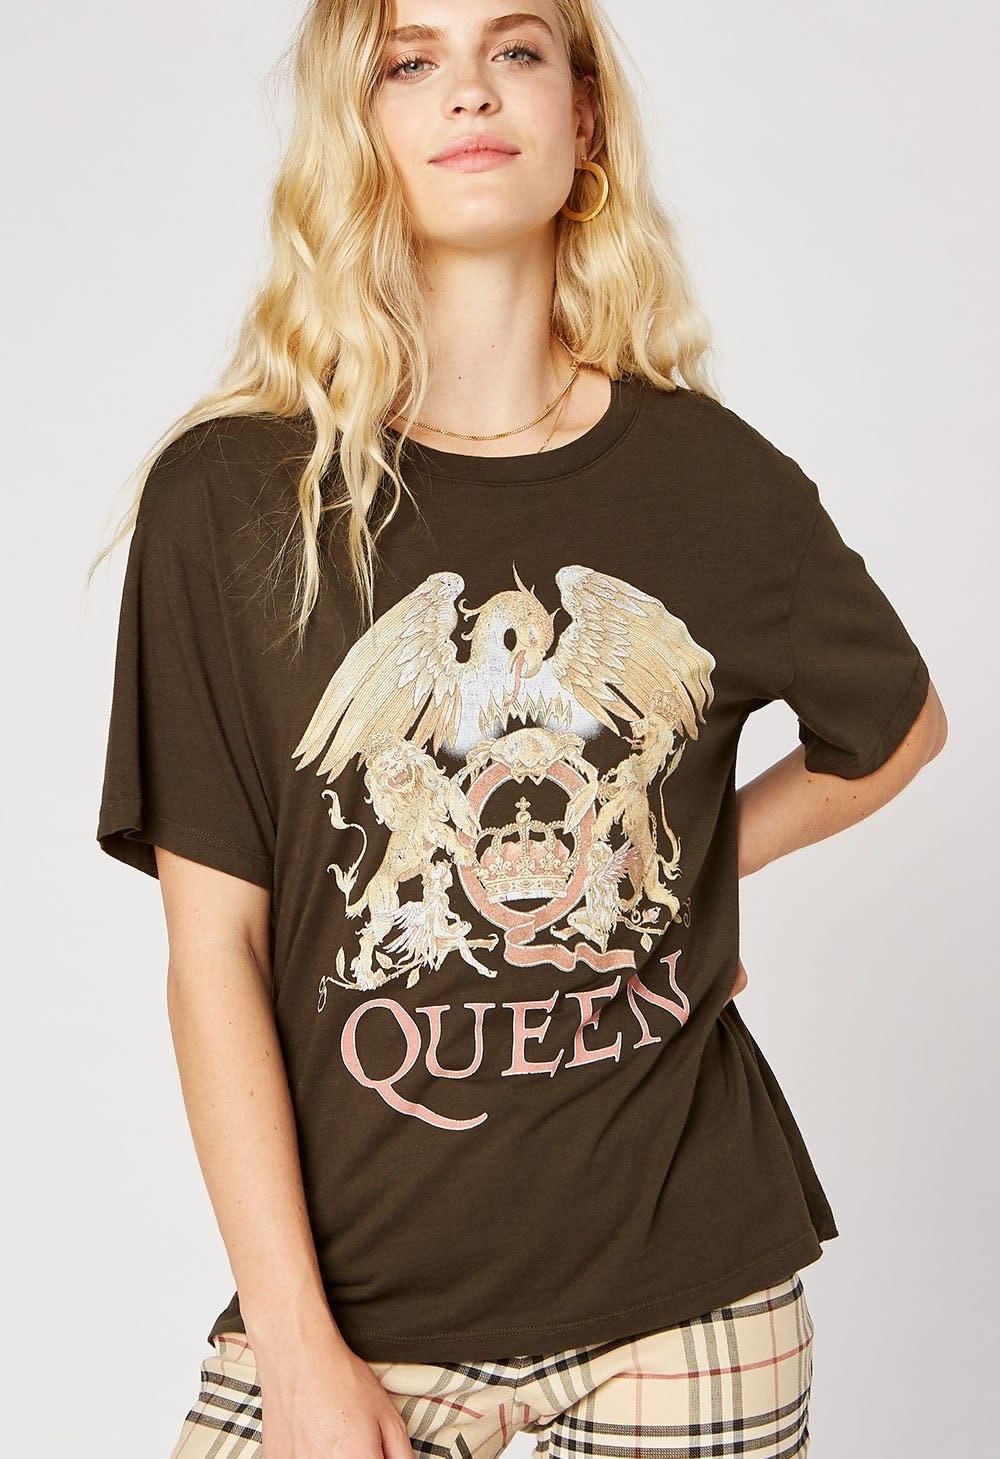 Seek The Label Queen Crest Boyfriend Tee